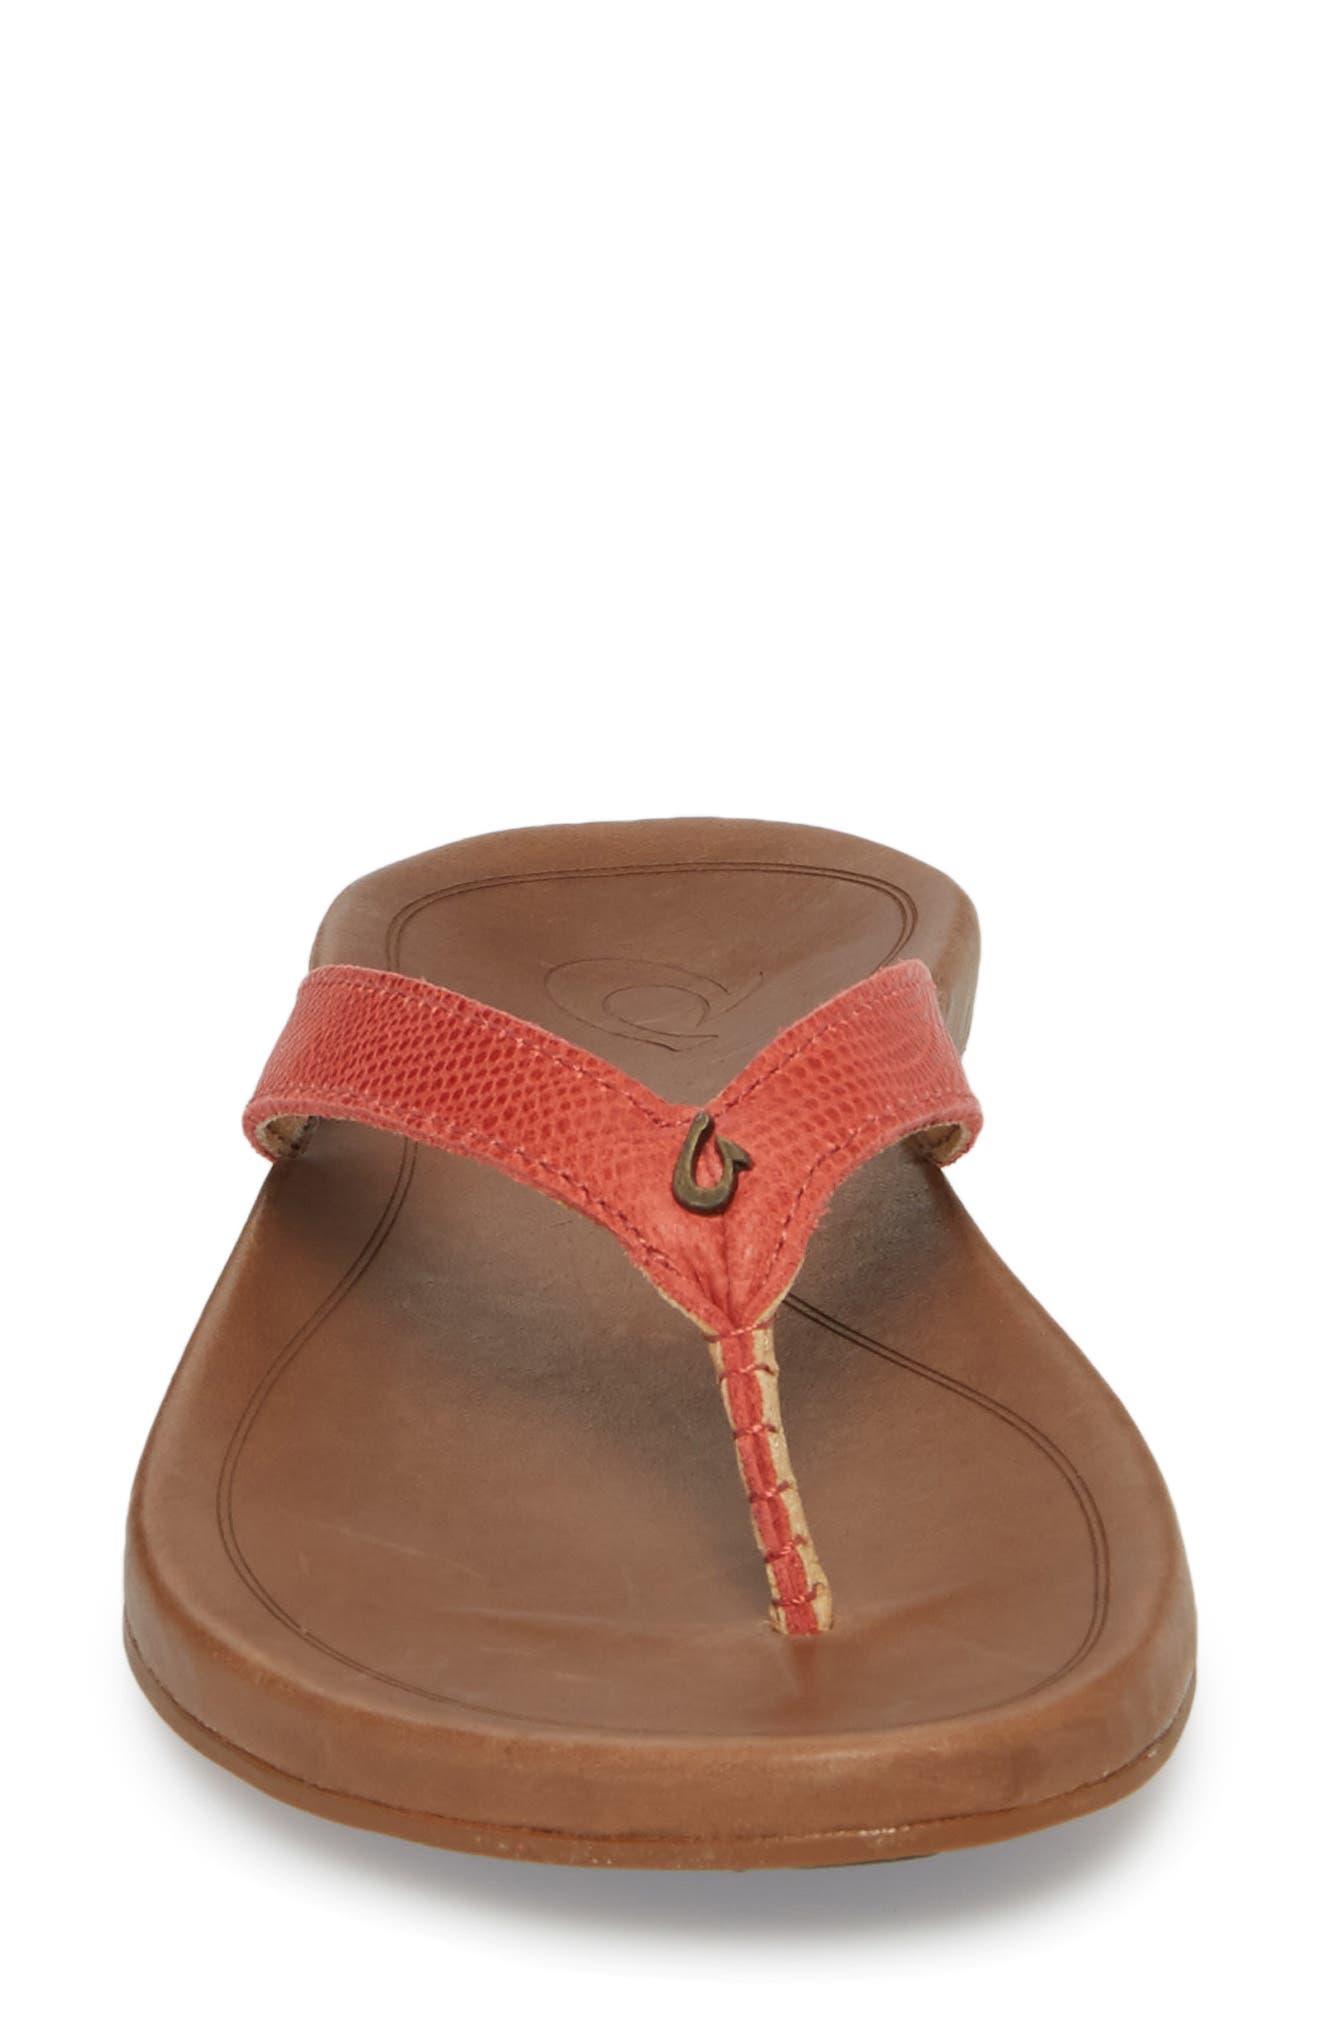 'Hi Ona' Flip Flop,                             Alternate thumbnail 4, color,                             Paprika/ Tan Leather